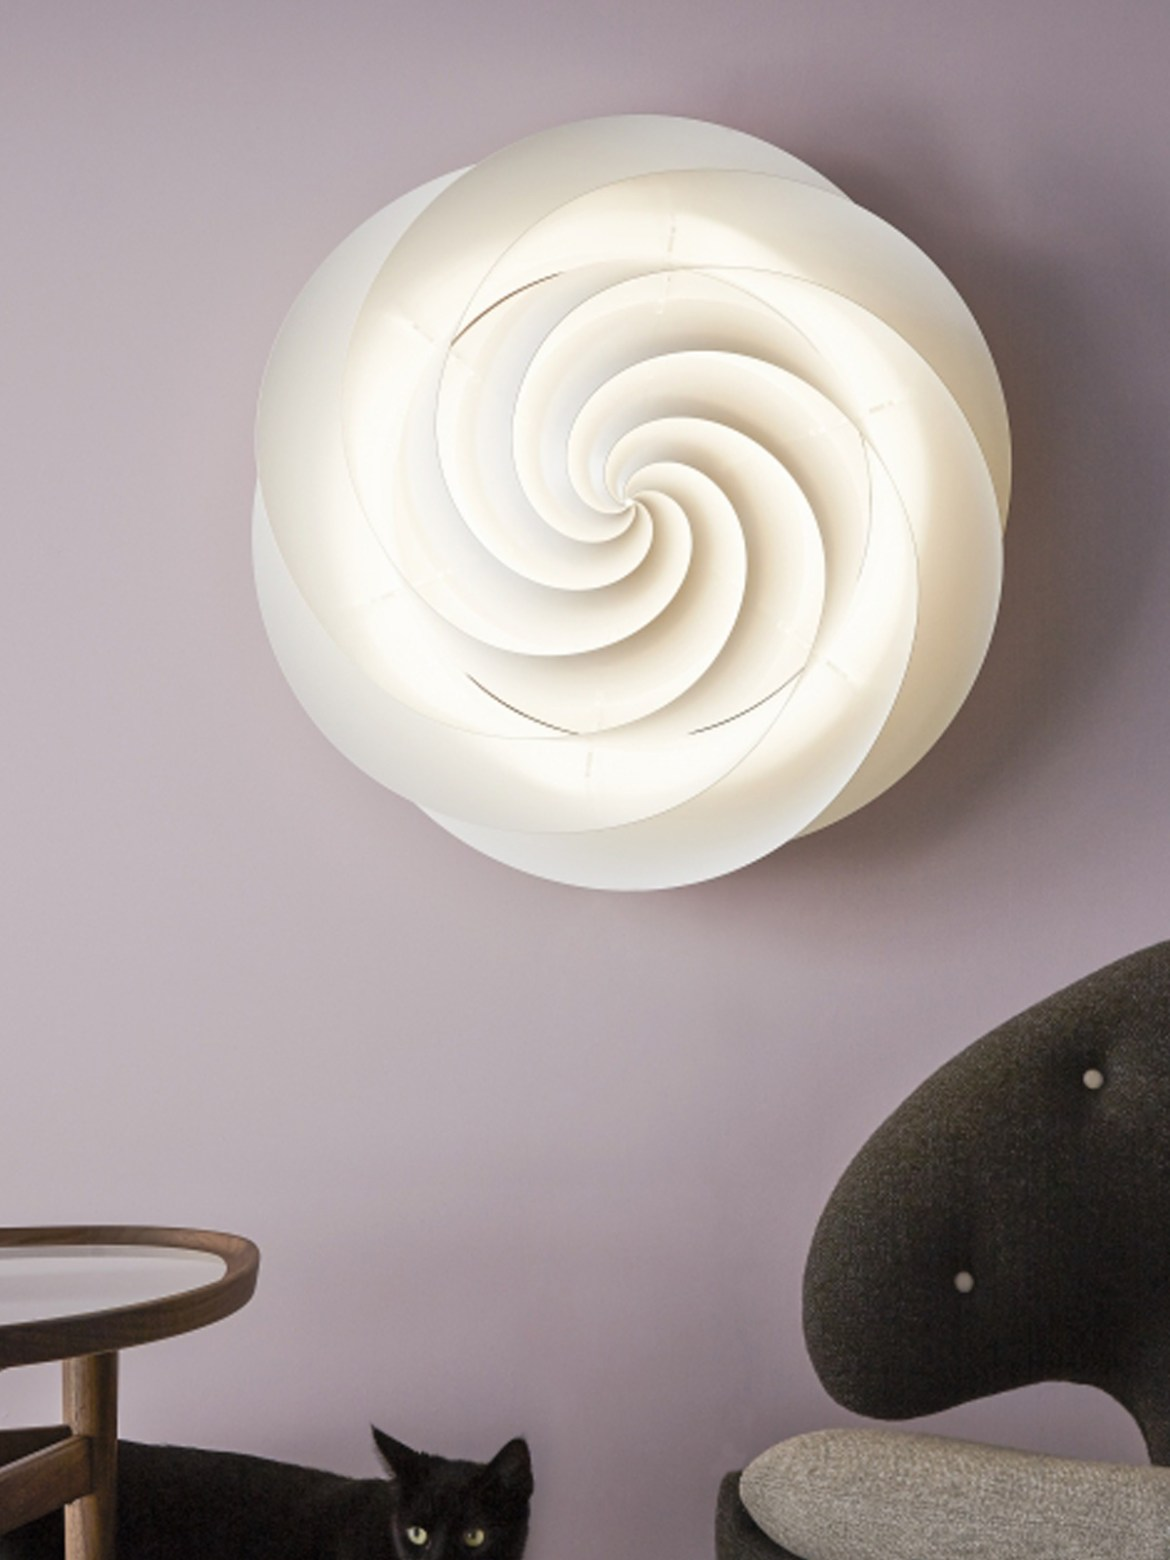 DesignOrt Blog: Wandleuchten X Mal Anders Le Klint Swirl Wandlampe oder Deckenlampe